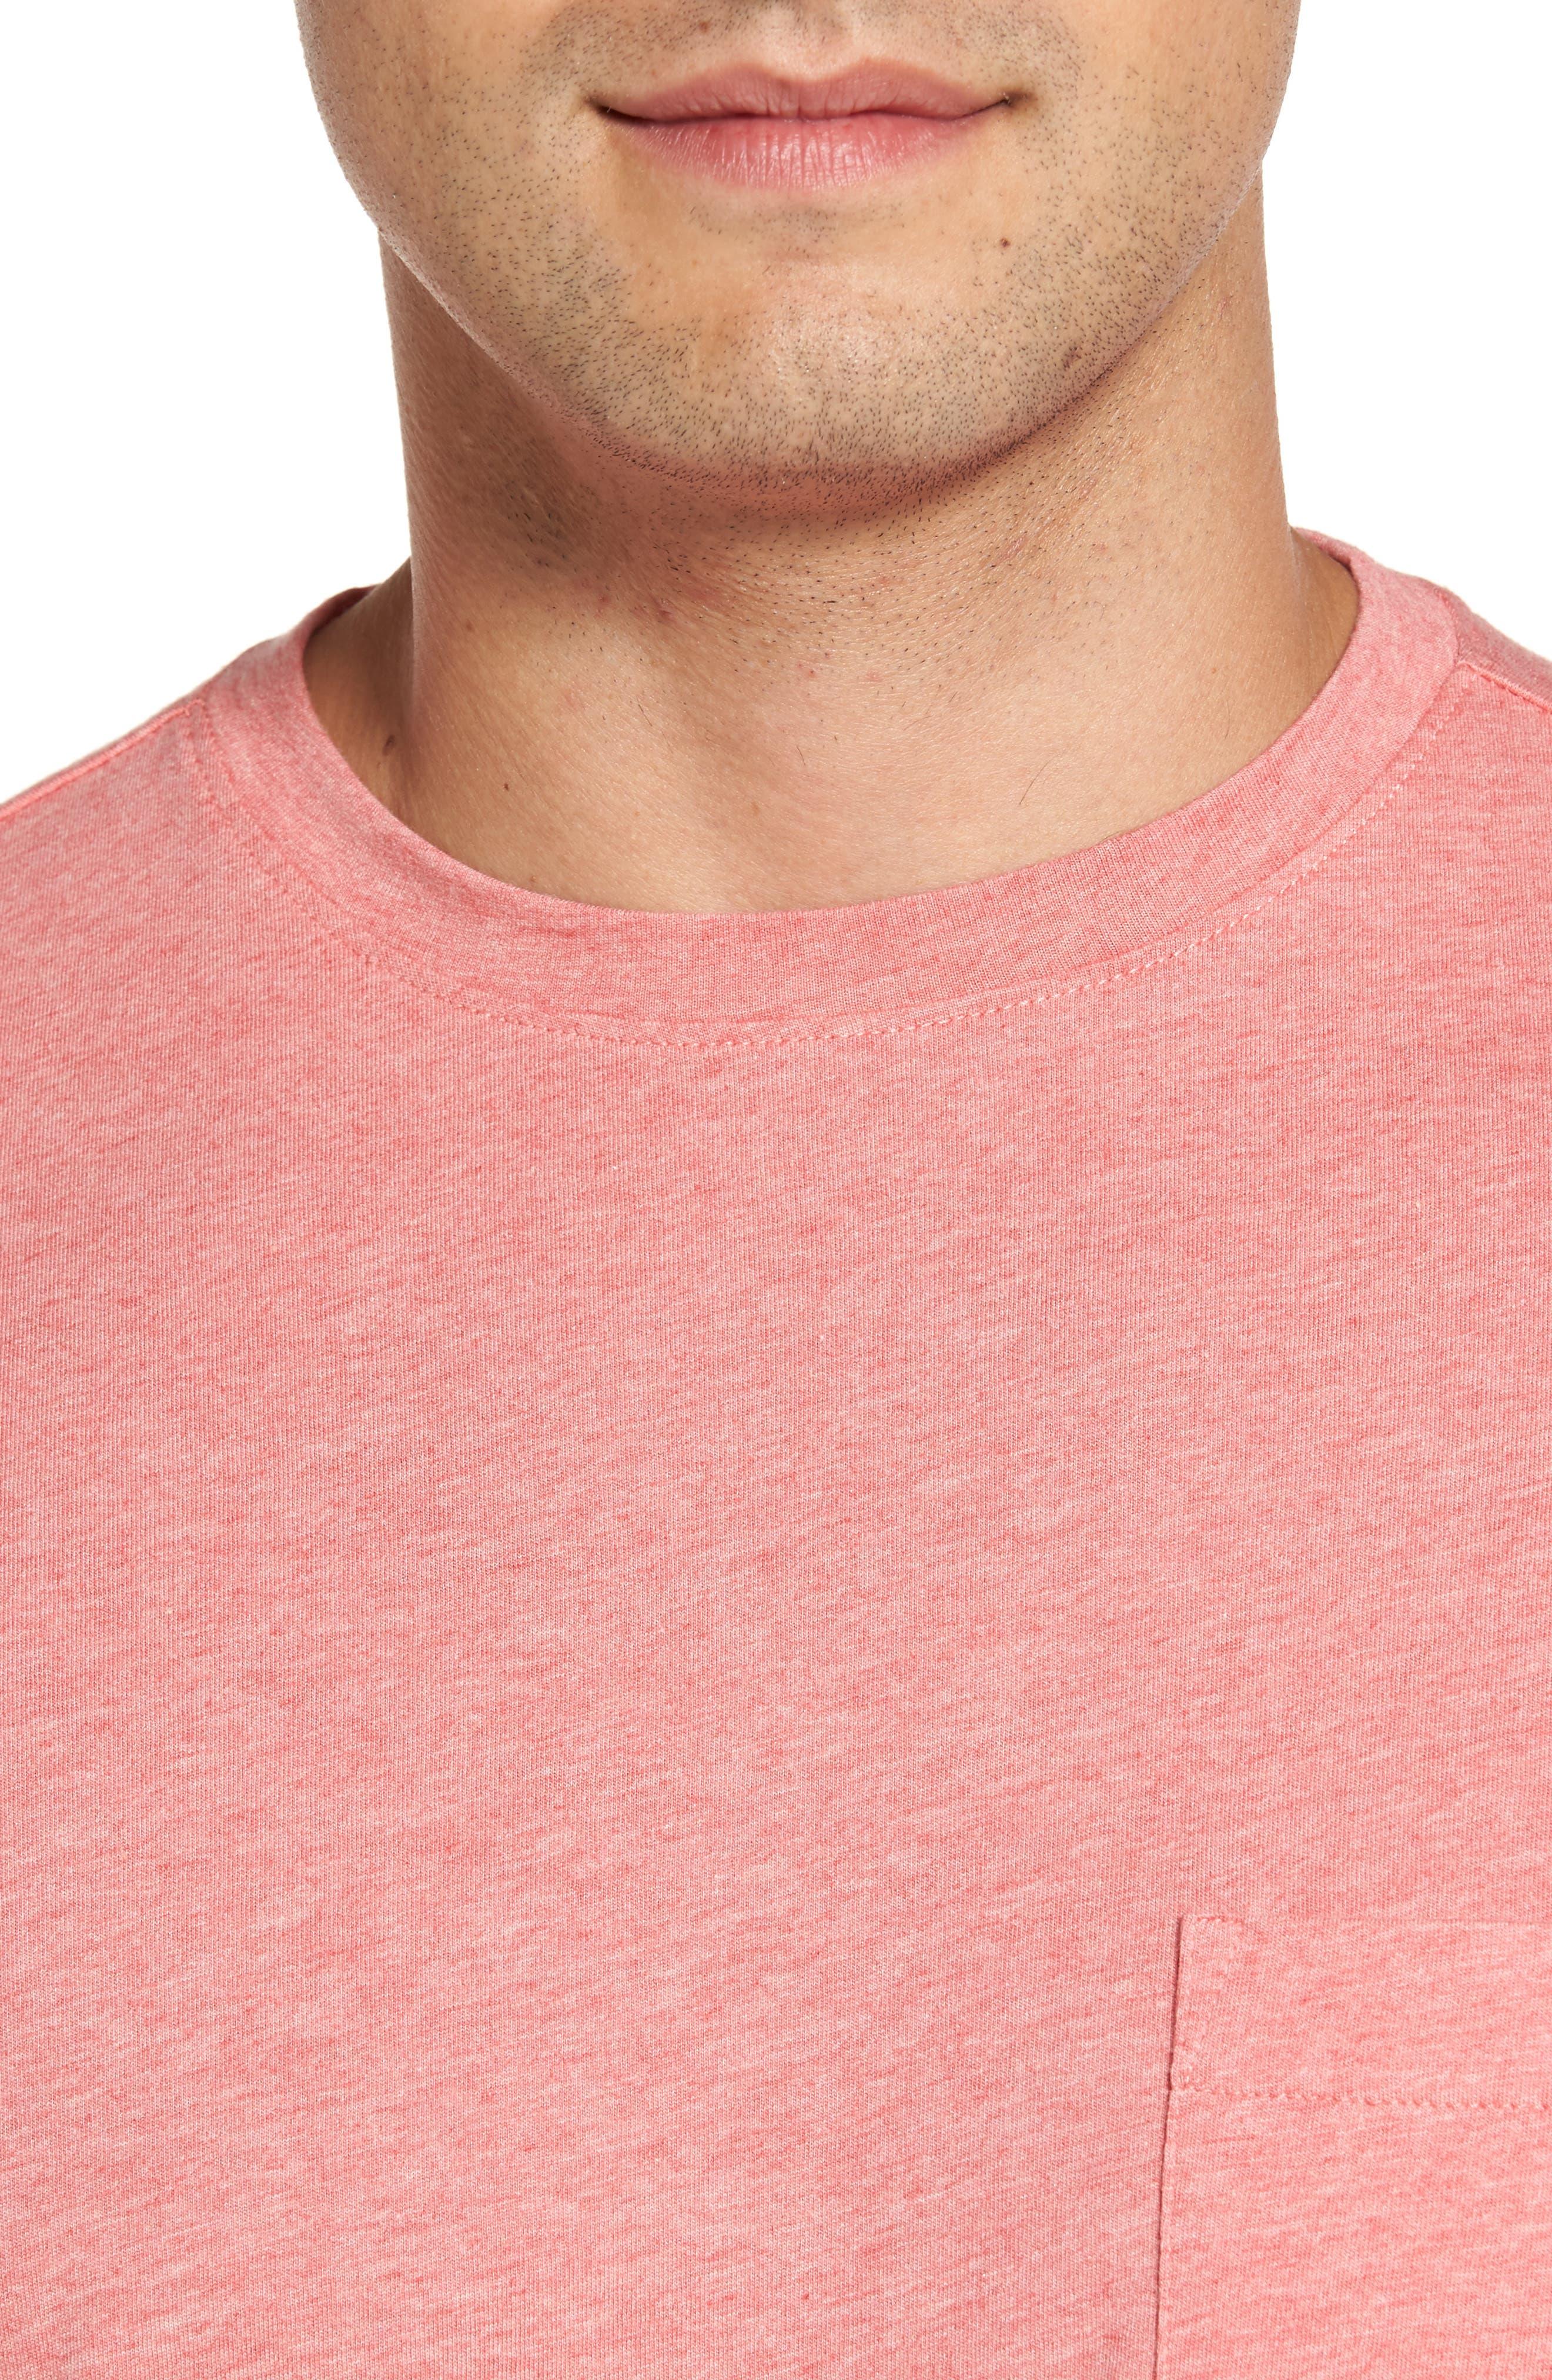 Crown Pocket T-Shirt,                             Alternate thumbnail 12, color,